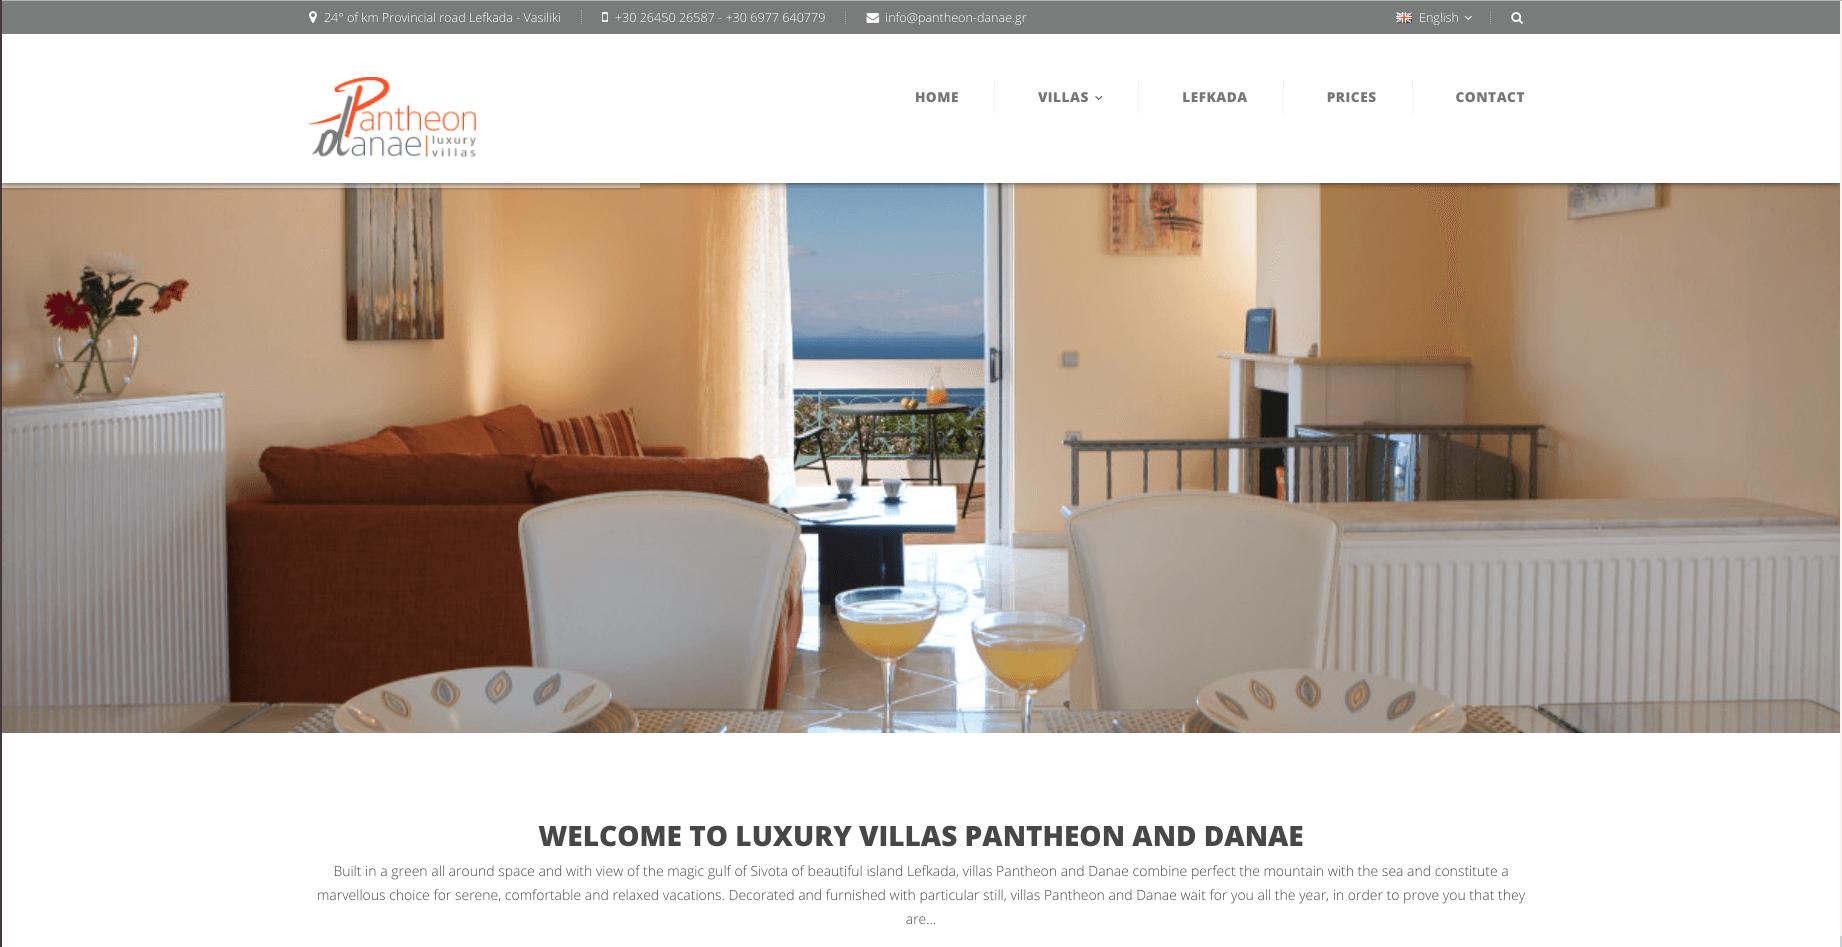 infinityweb-villa-pantheon-danae-homepage